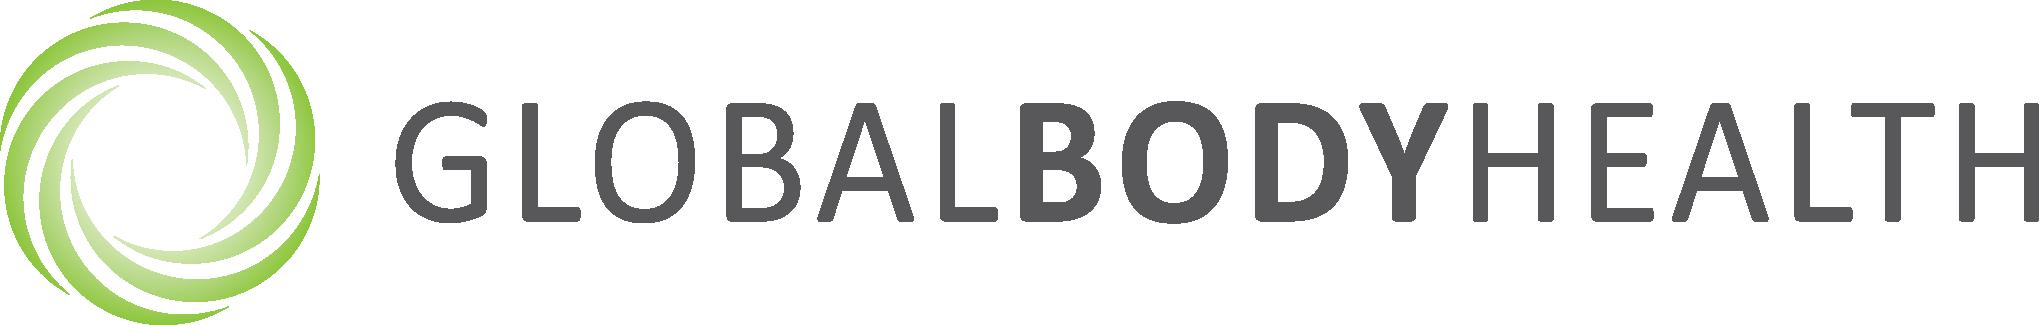 GBH logo_col_vert.png